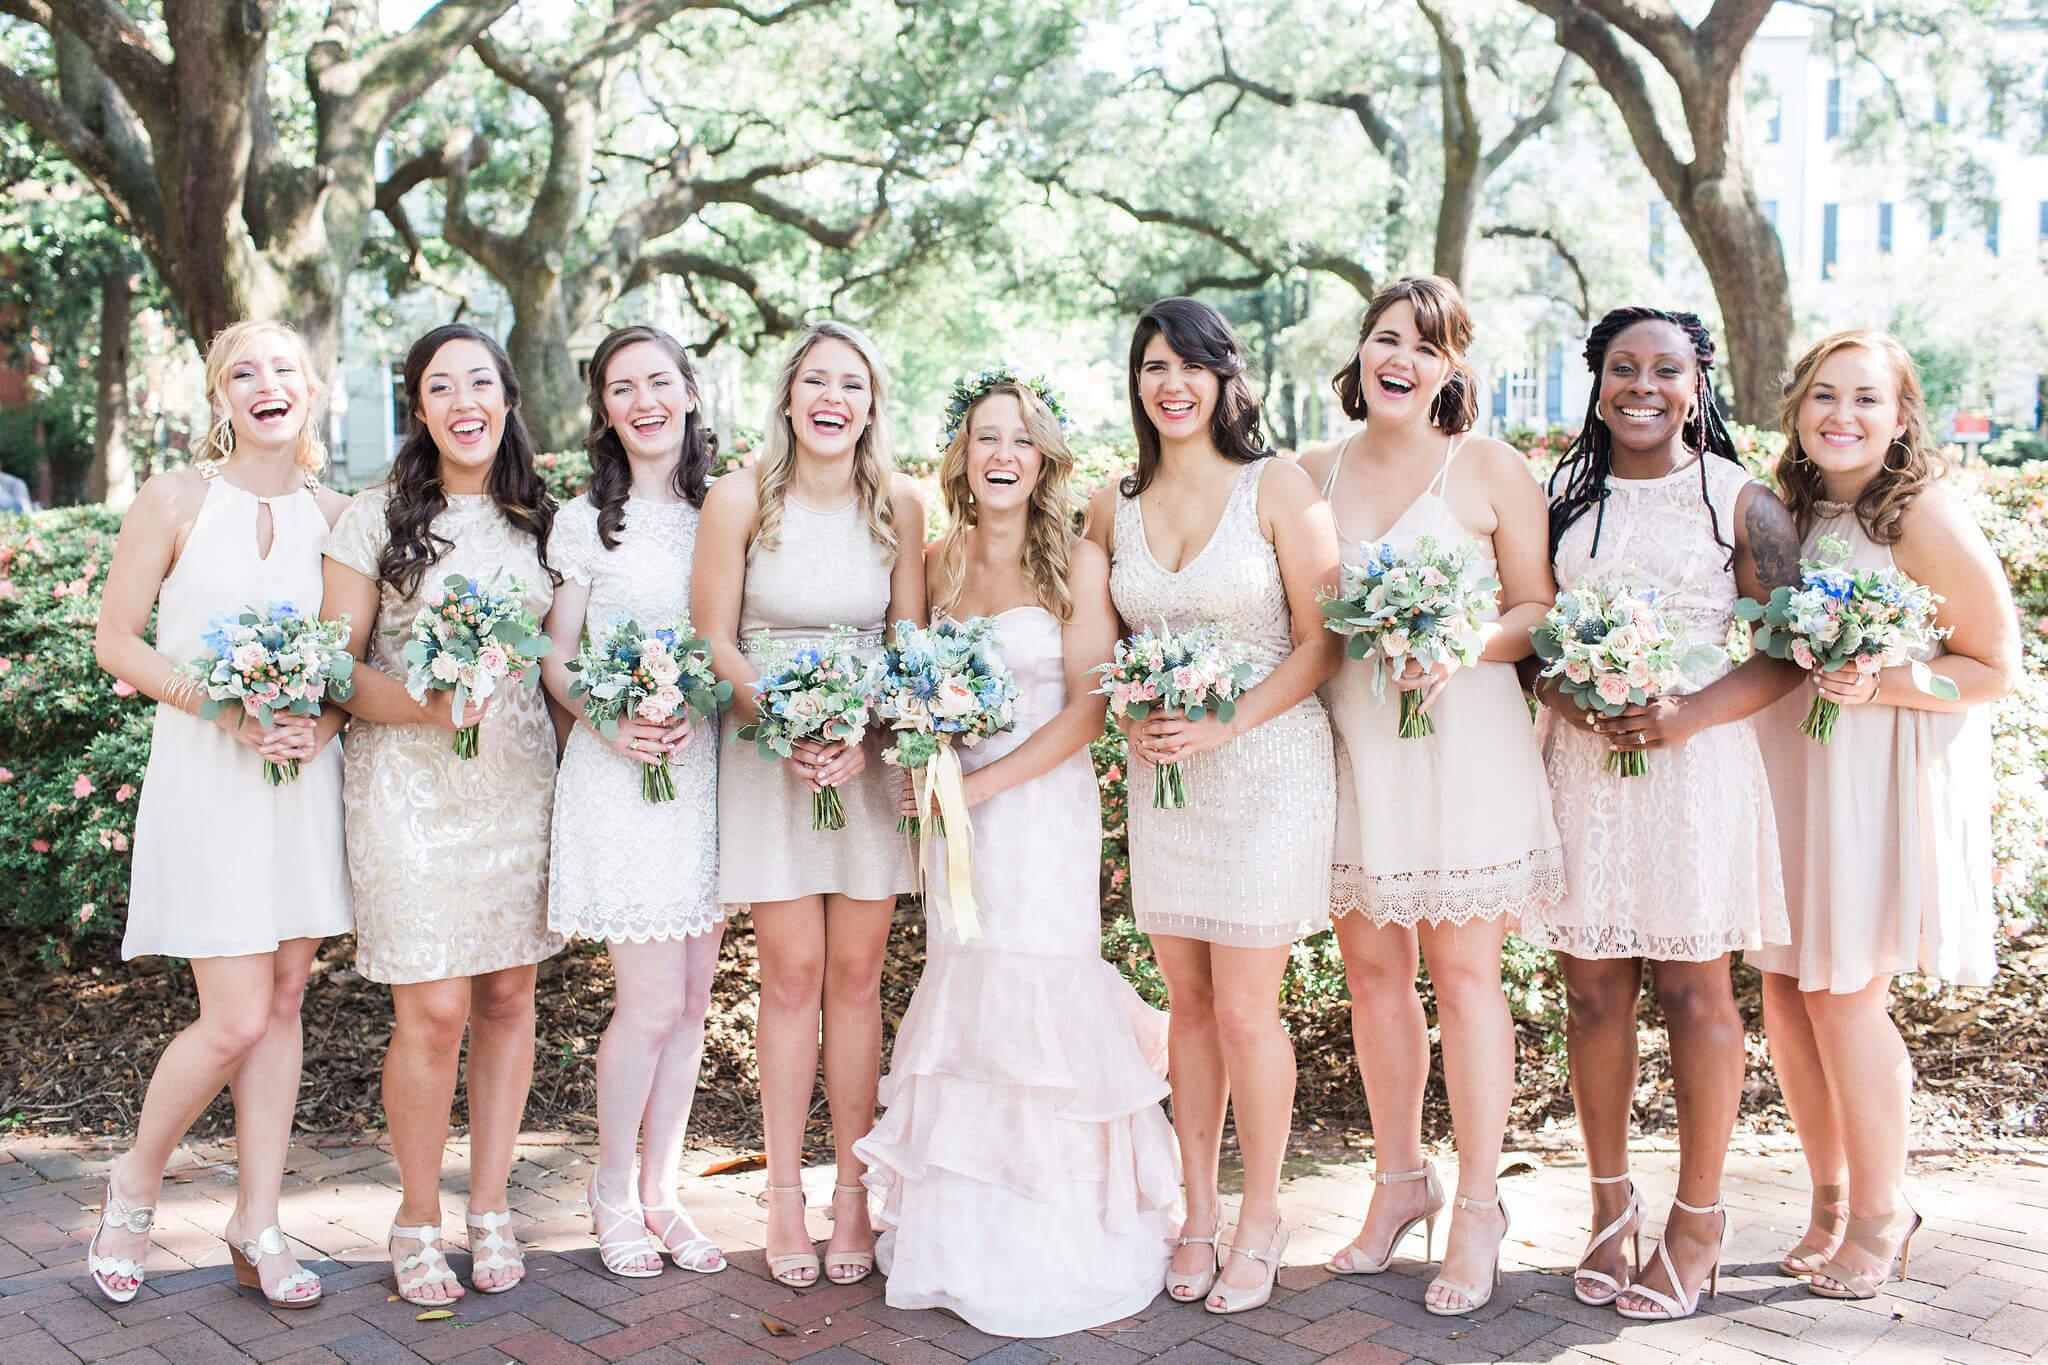 apt-b-photography-savannah-wedding-photographer-savannah-wedding-forsyth-park-elopement-intimate-wedding-photographer-18.JPG